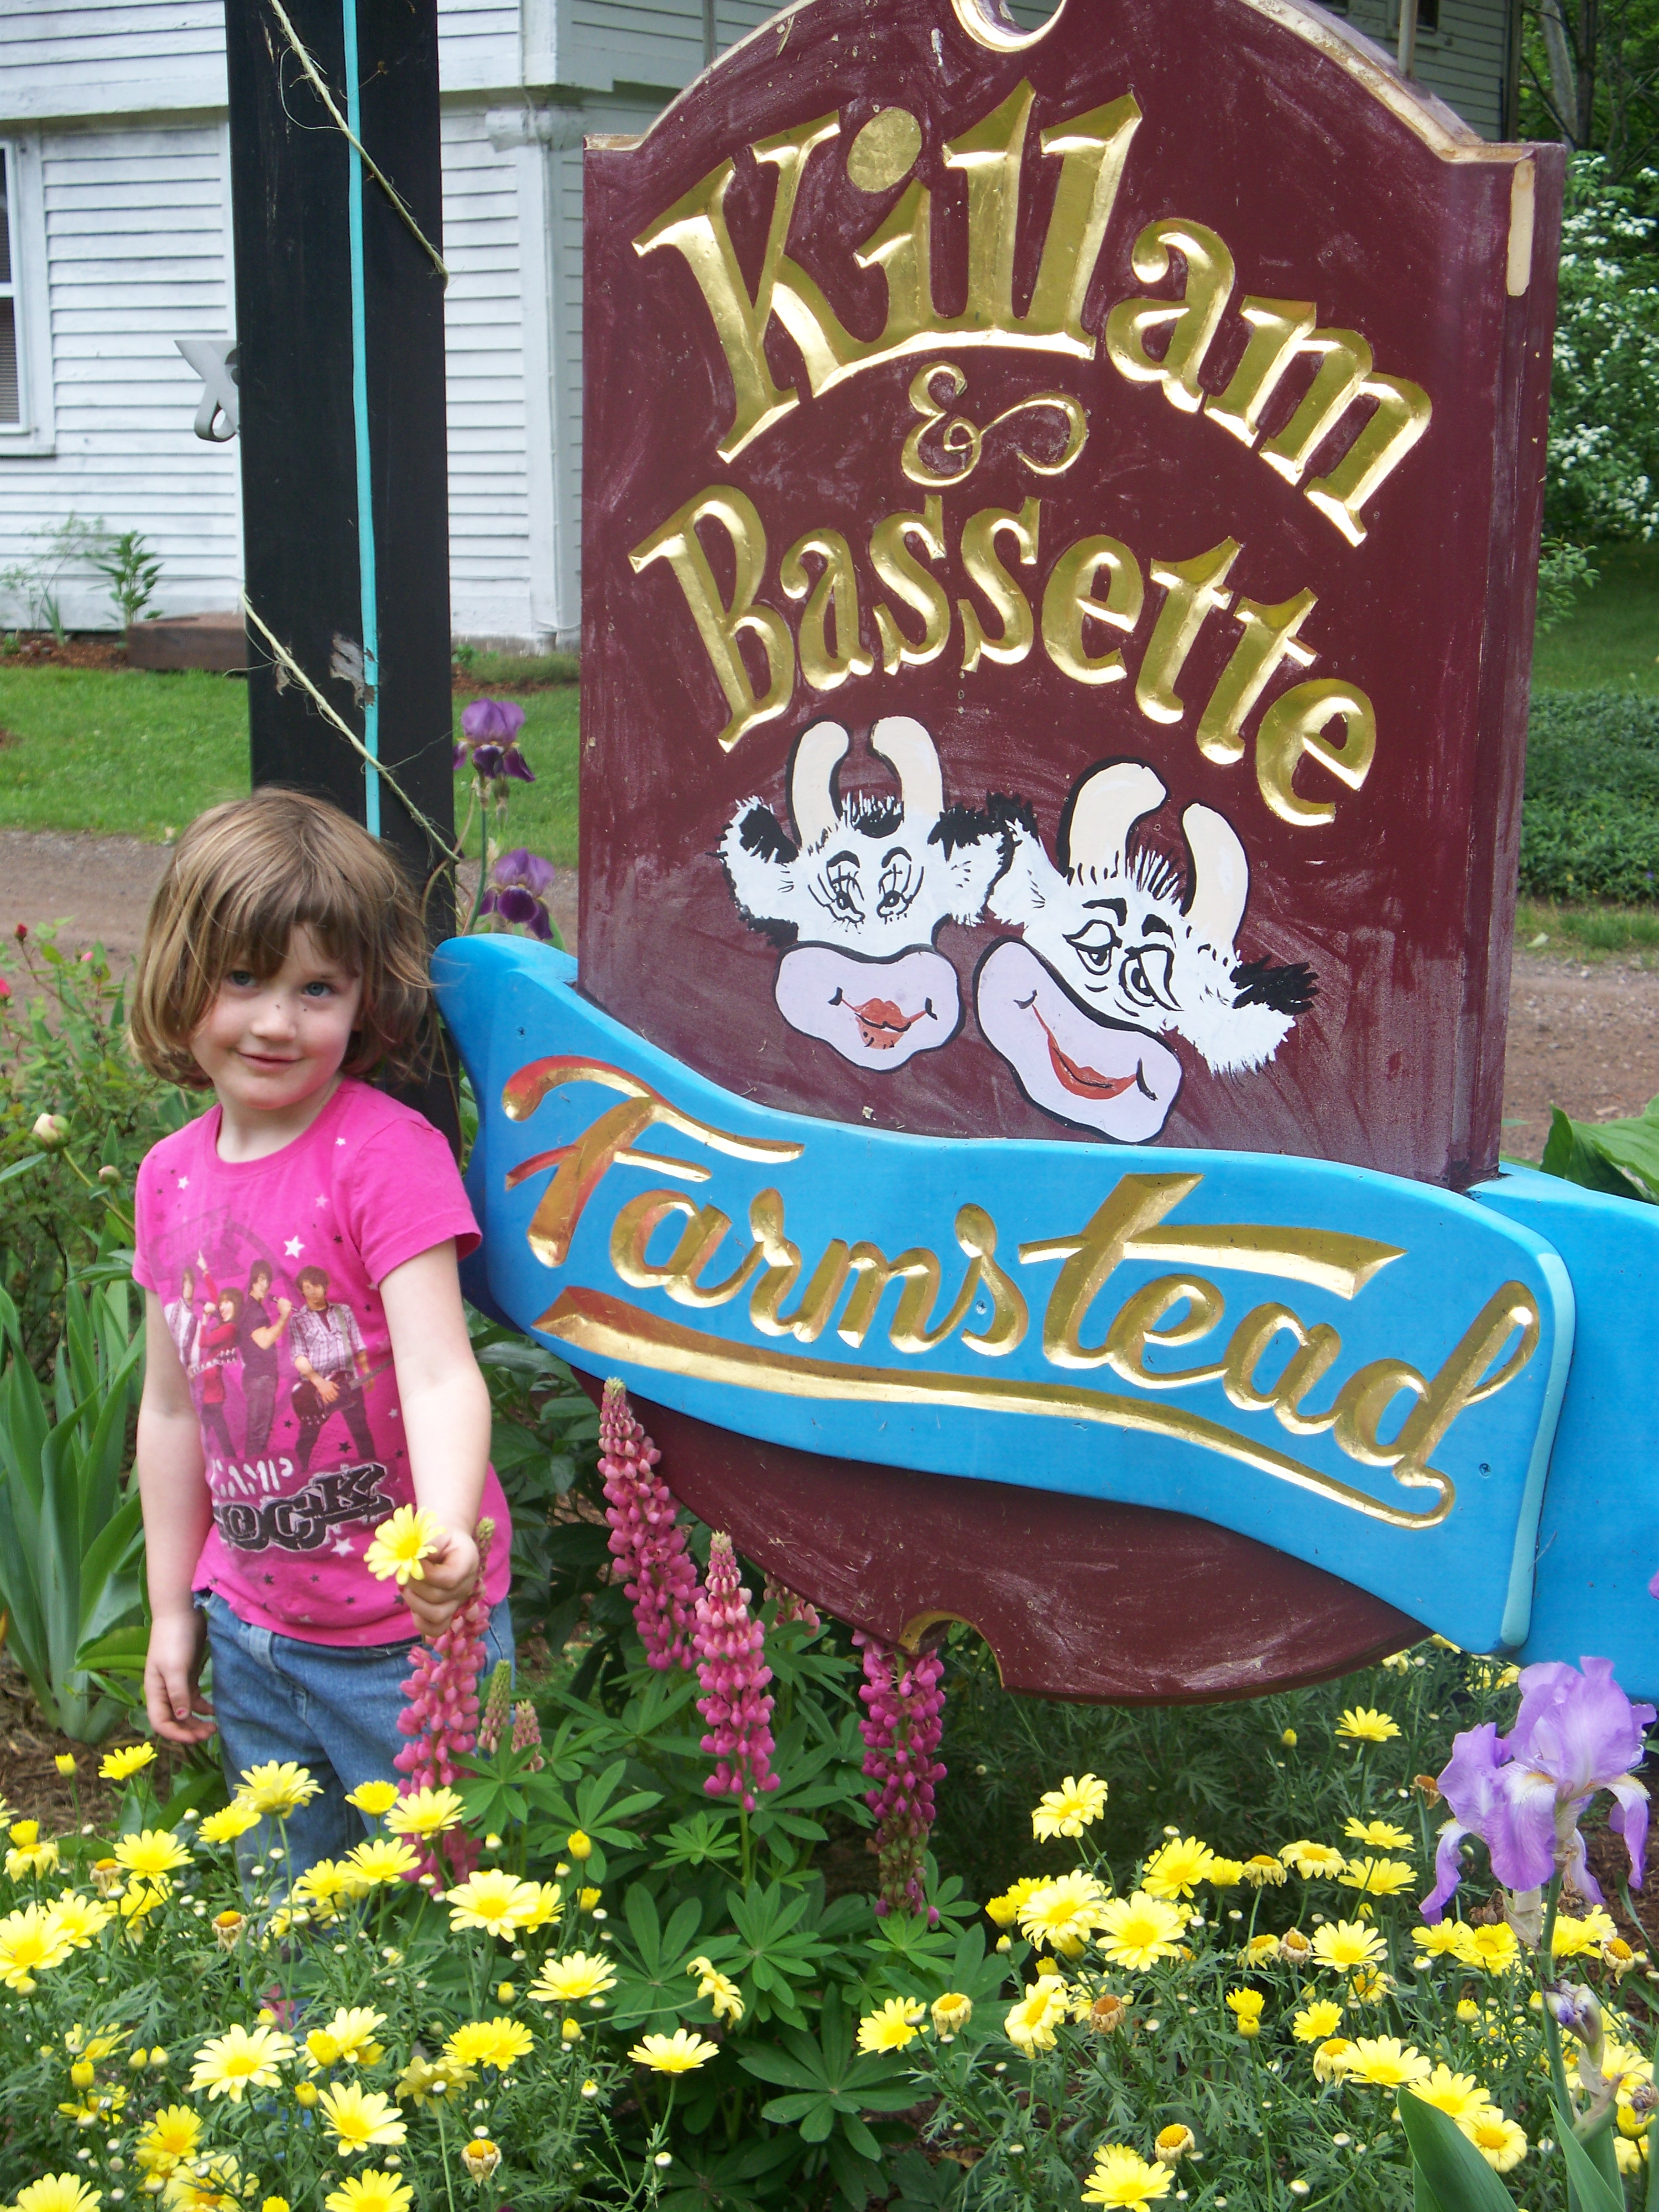 Killam & Bassette Farmstead-appears with permission